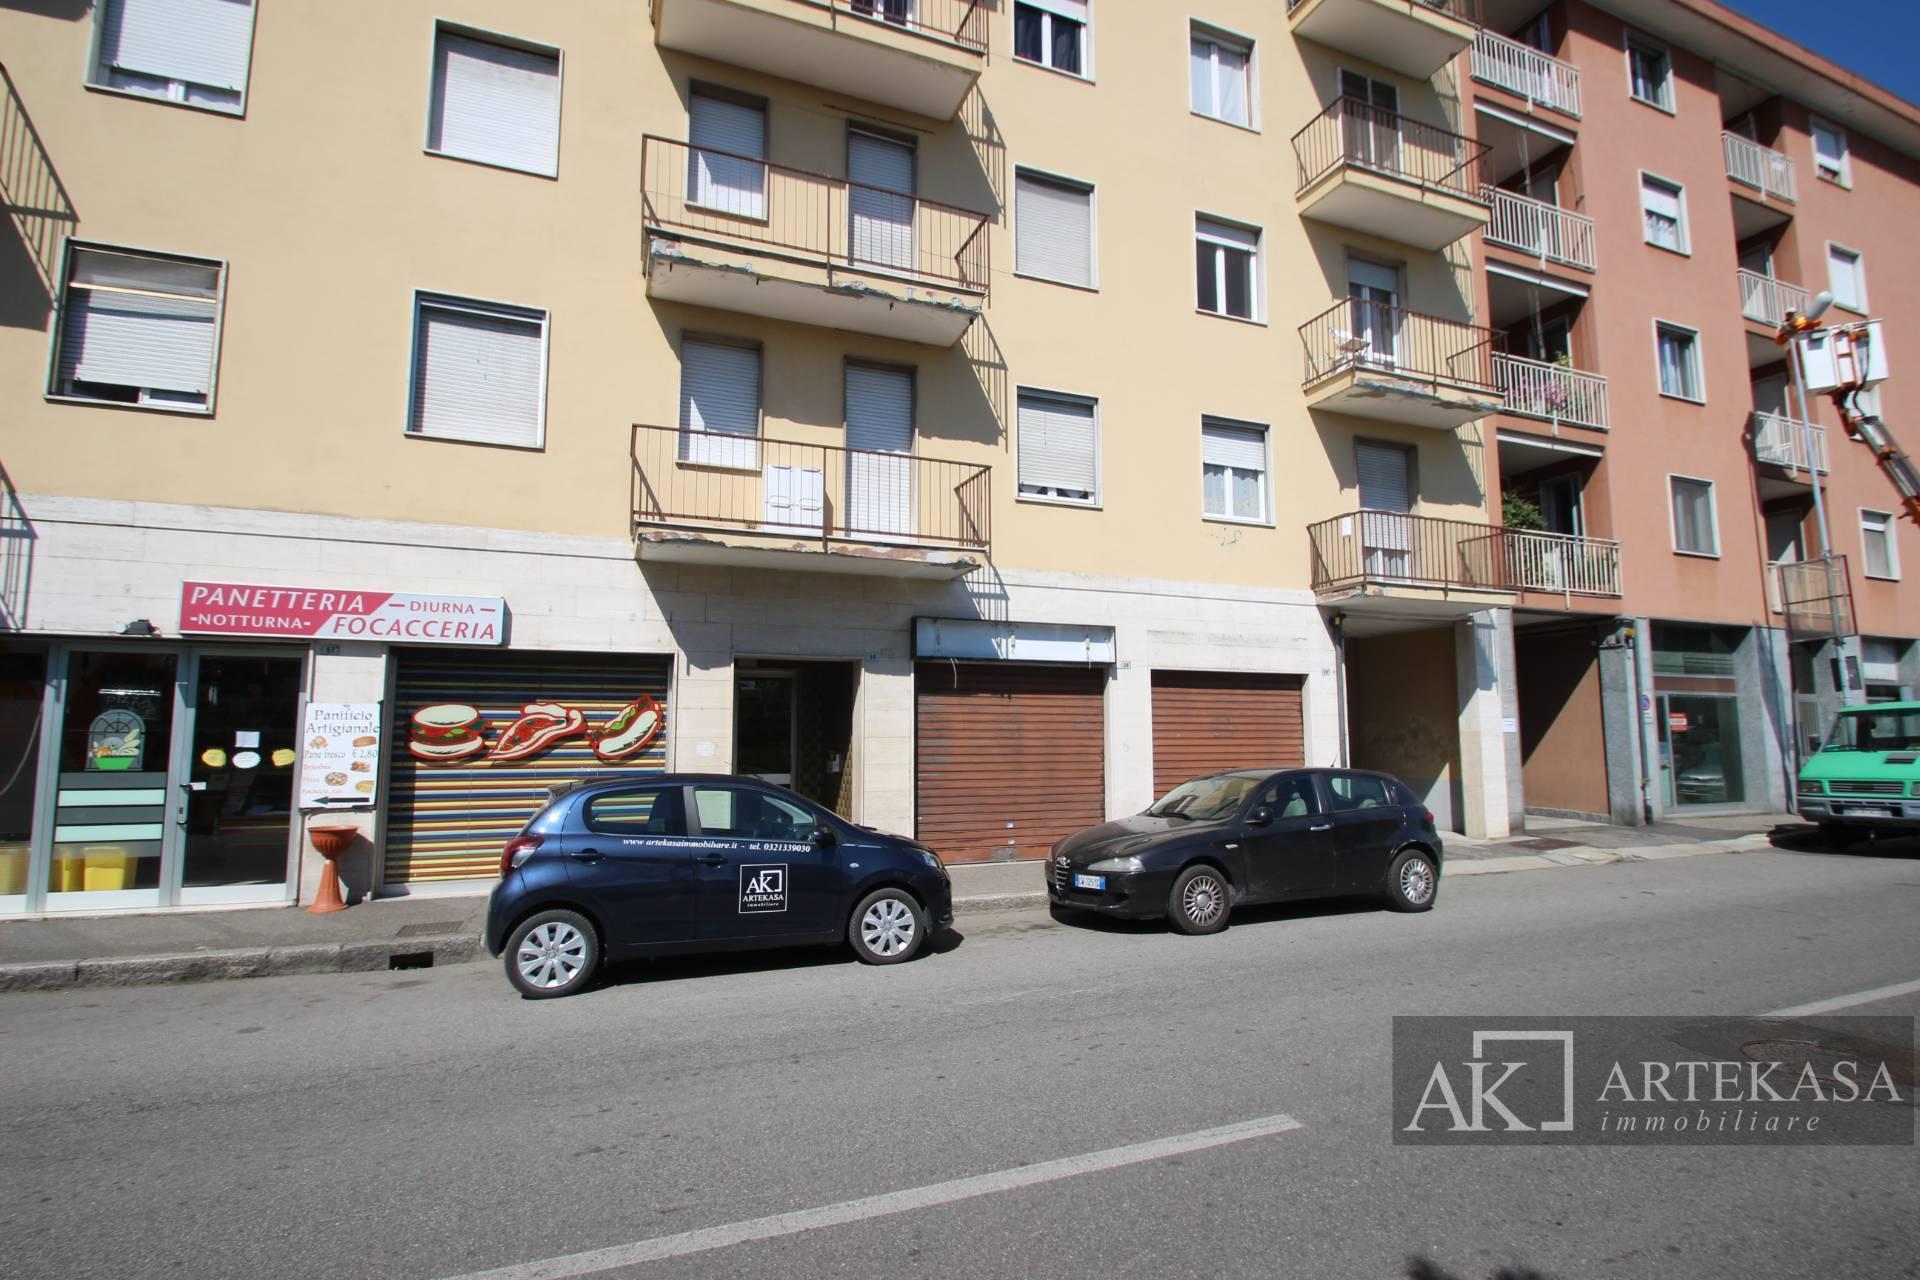 3 Locali Novara - Sant'andrea - San Rocco